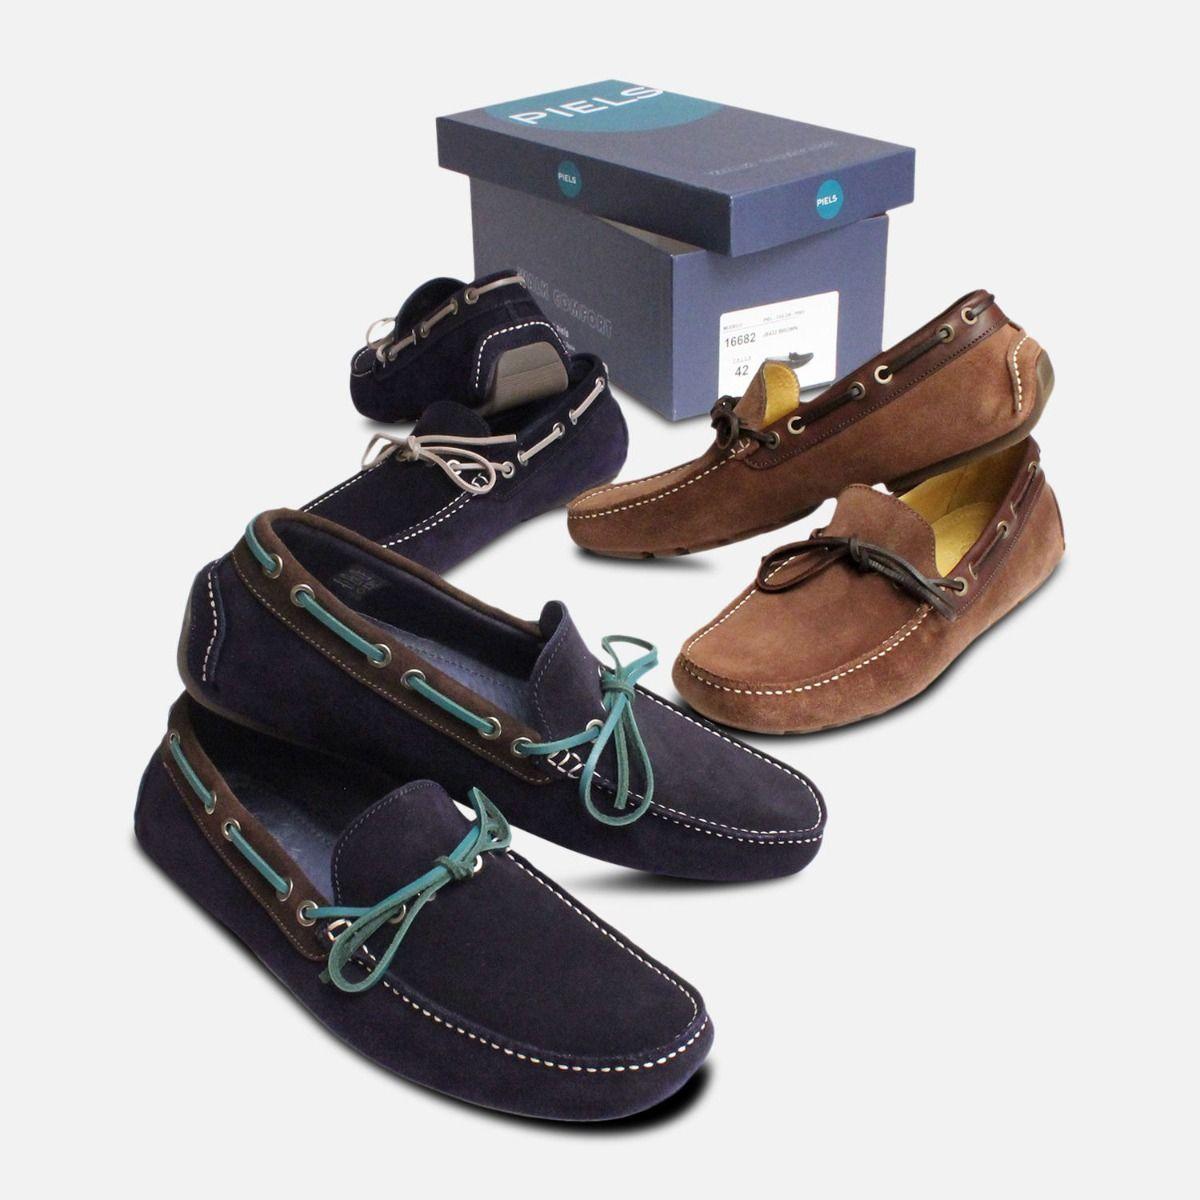 Navy Blue & Green Designer Driving Shoes